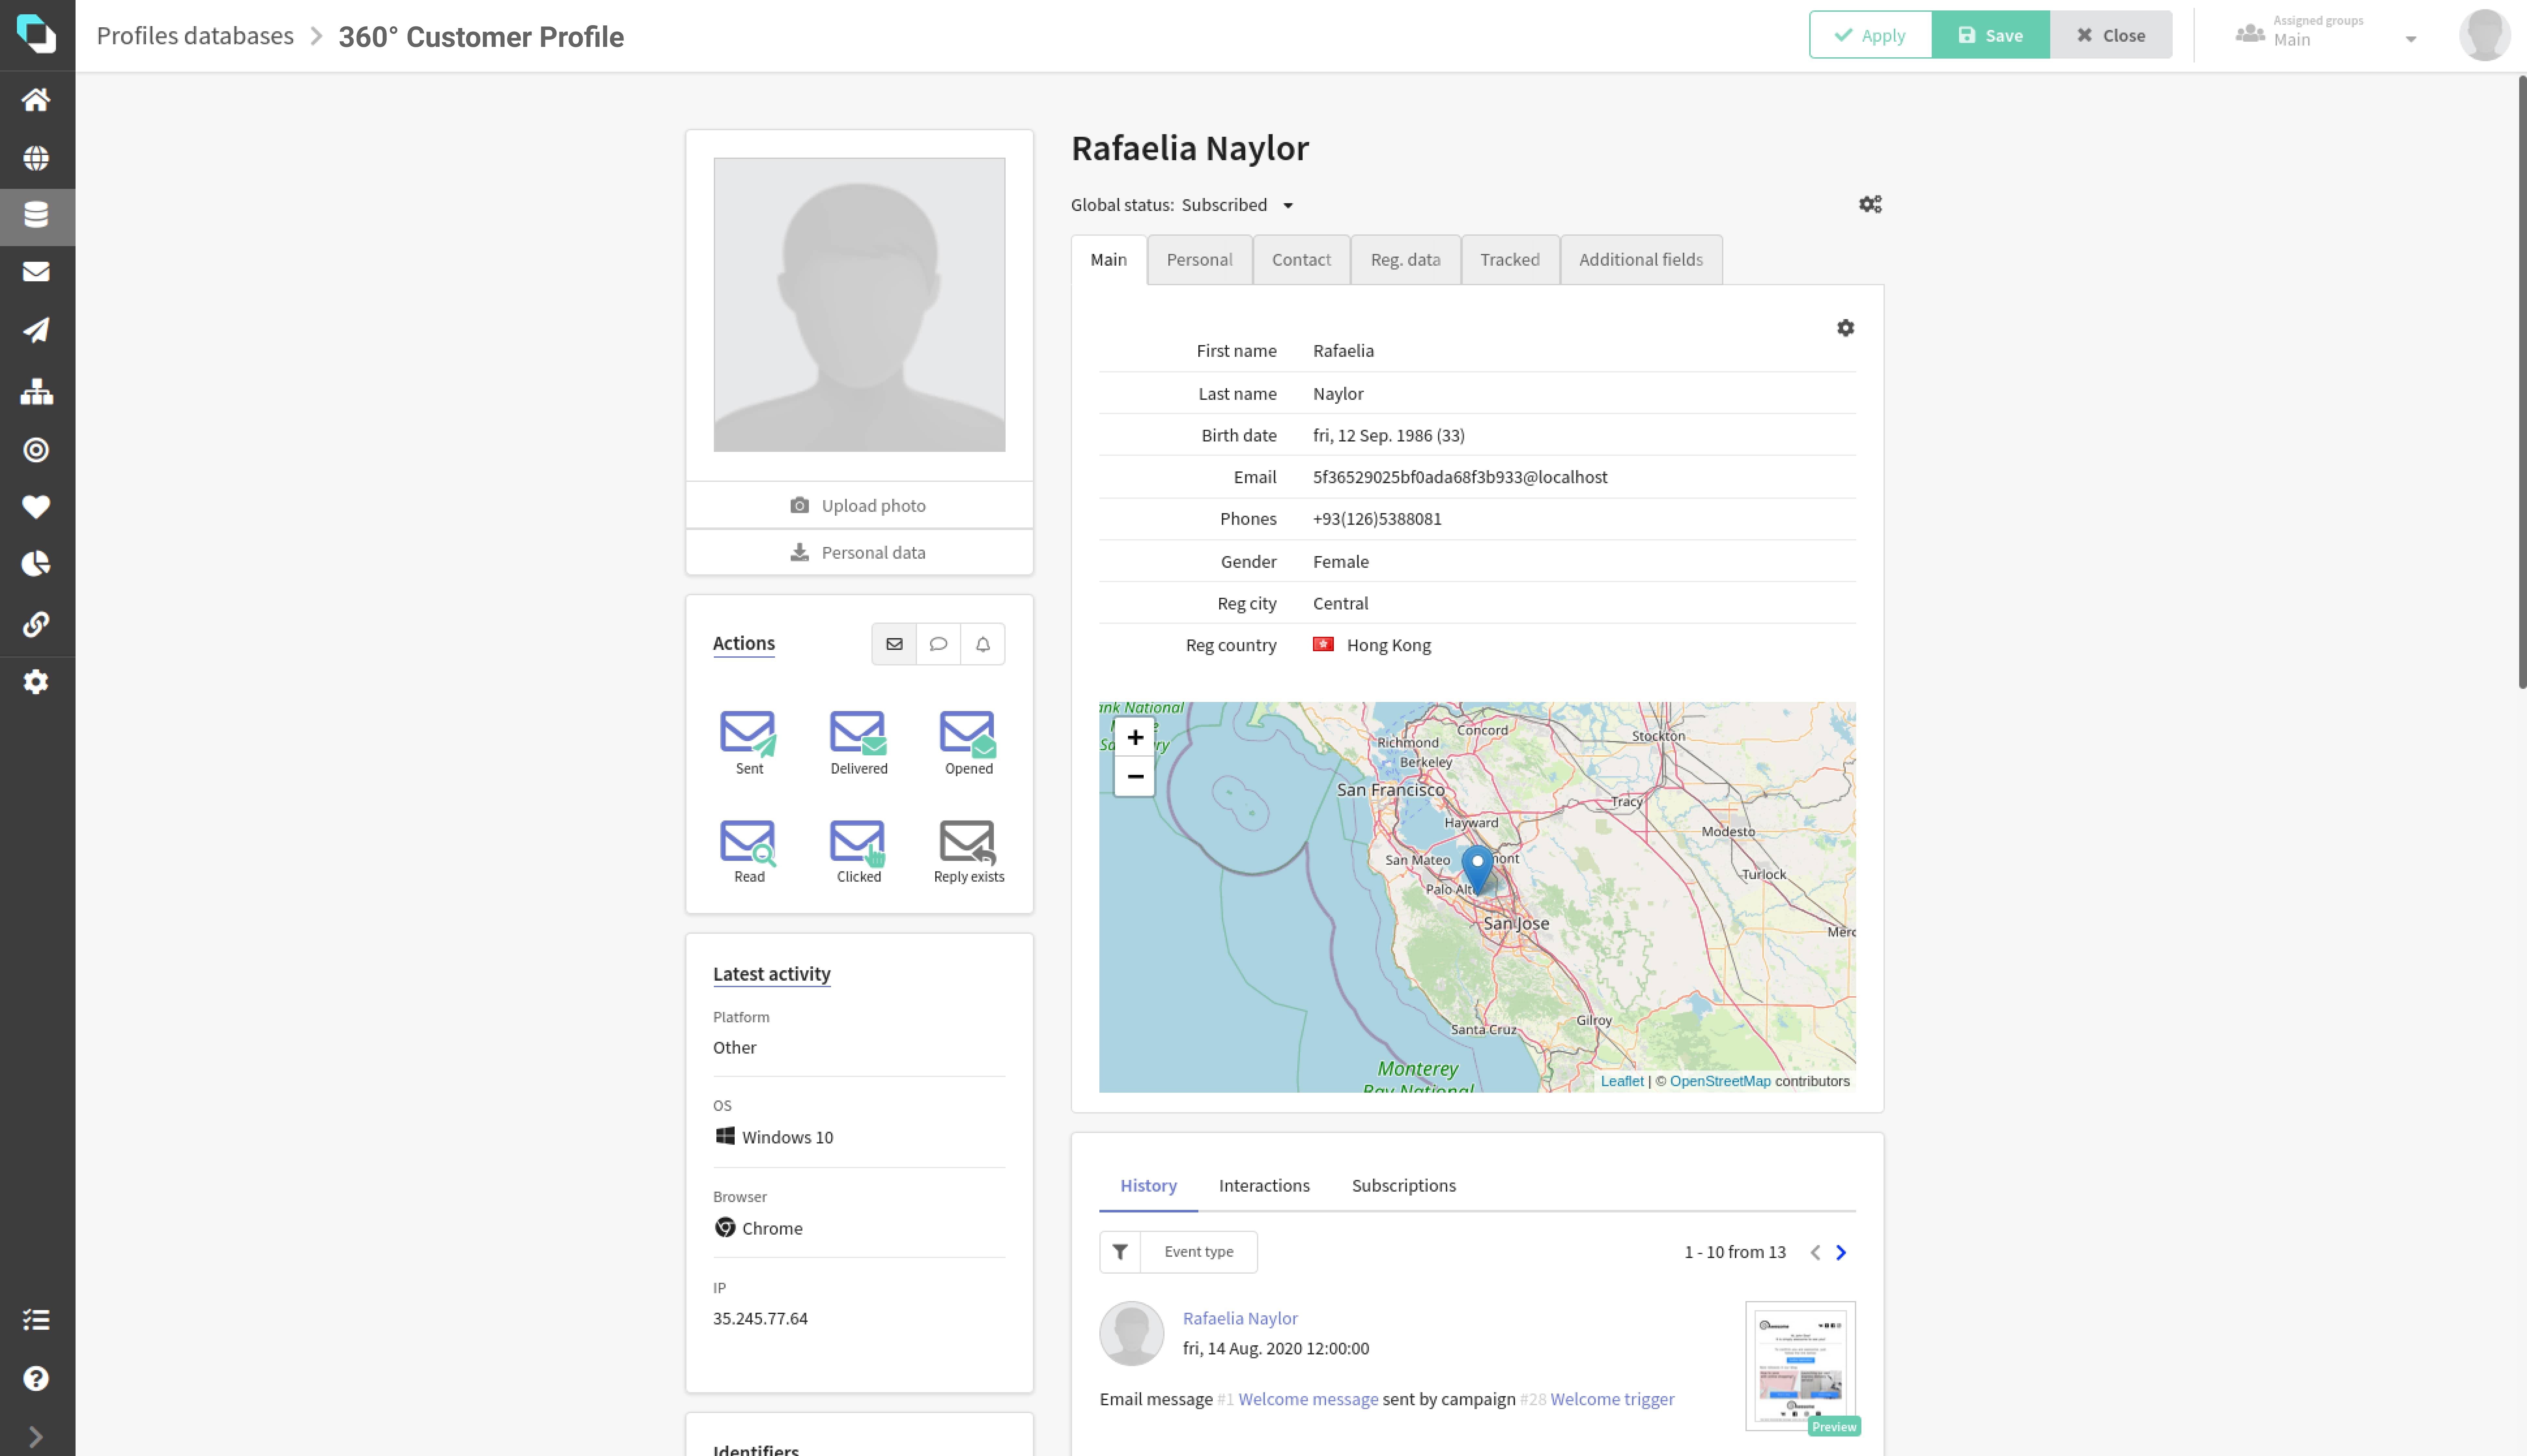 ALTKRAFT screenshot: 360 Customer Profile